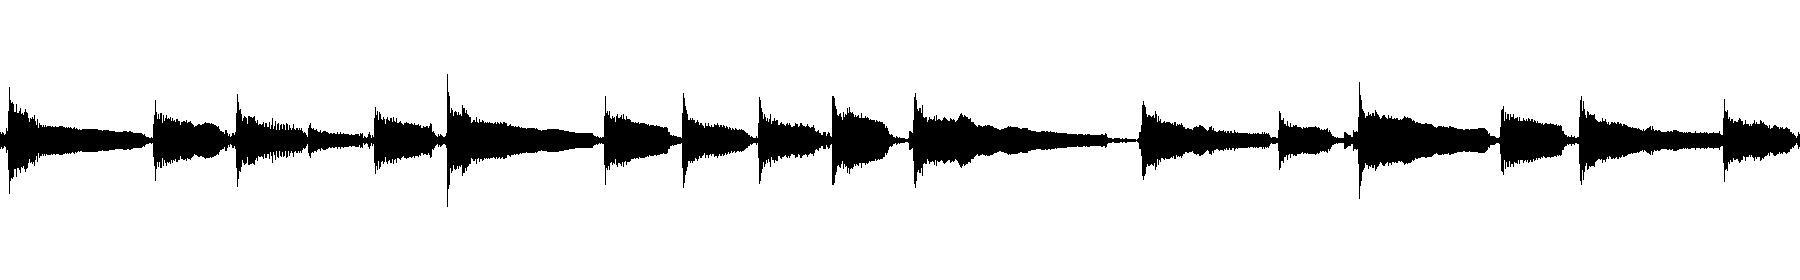 fl bluesguitar acoustic licks 78bpm f 21